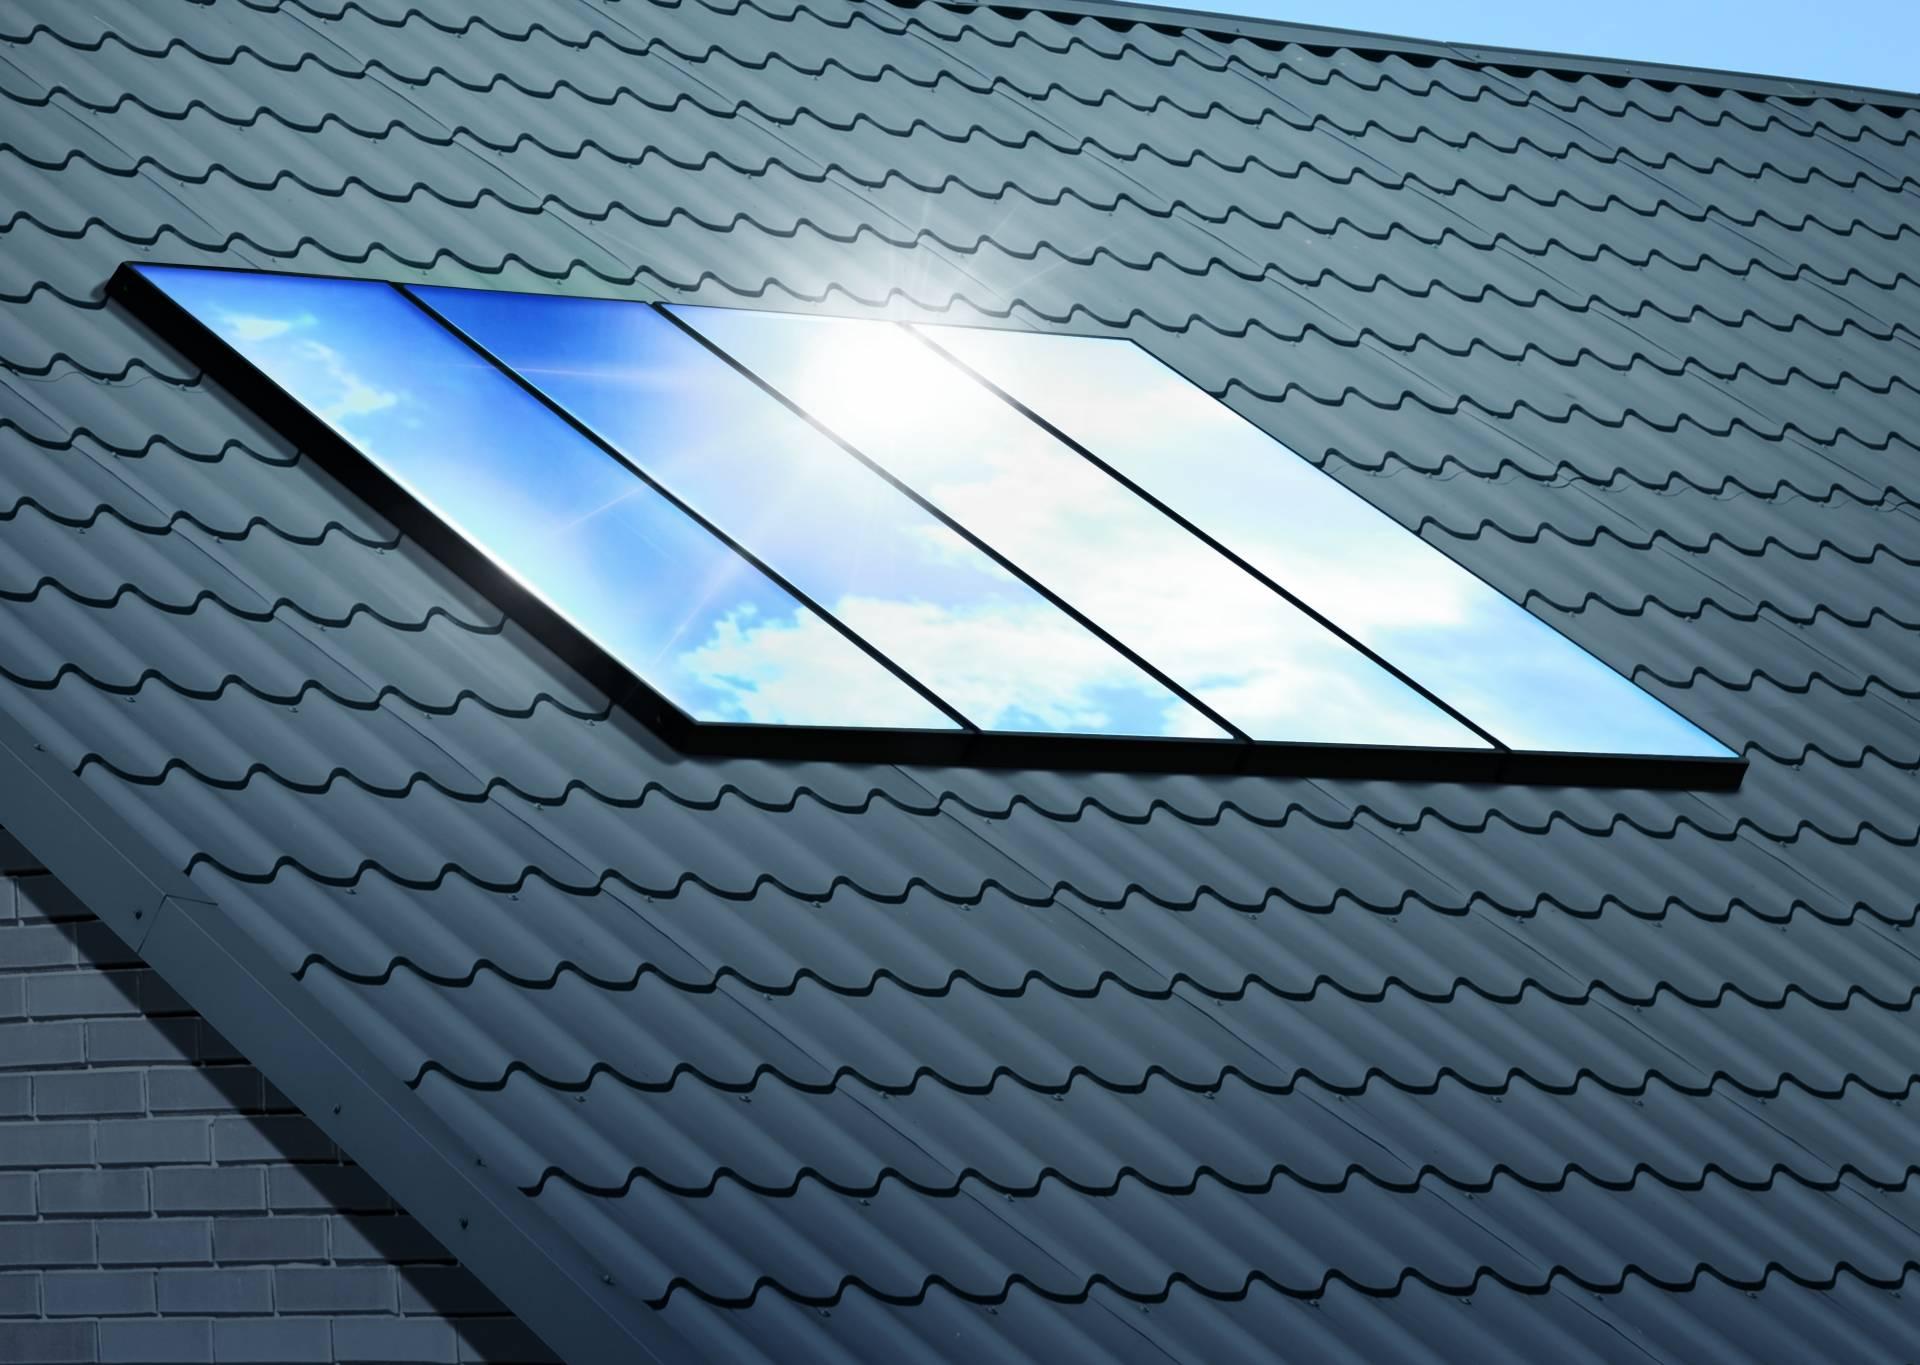 viessmann-solaire-chartres